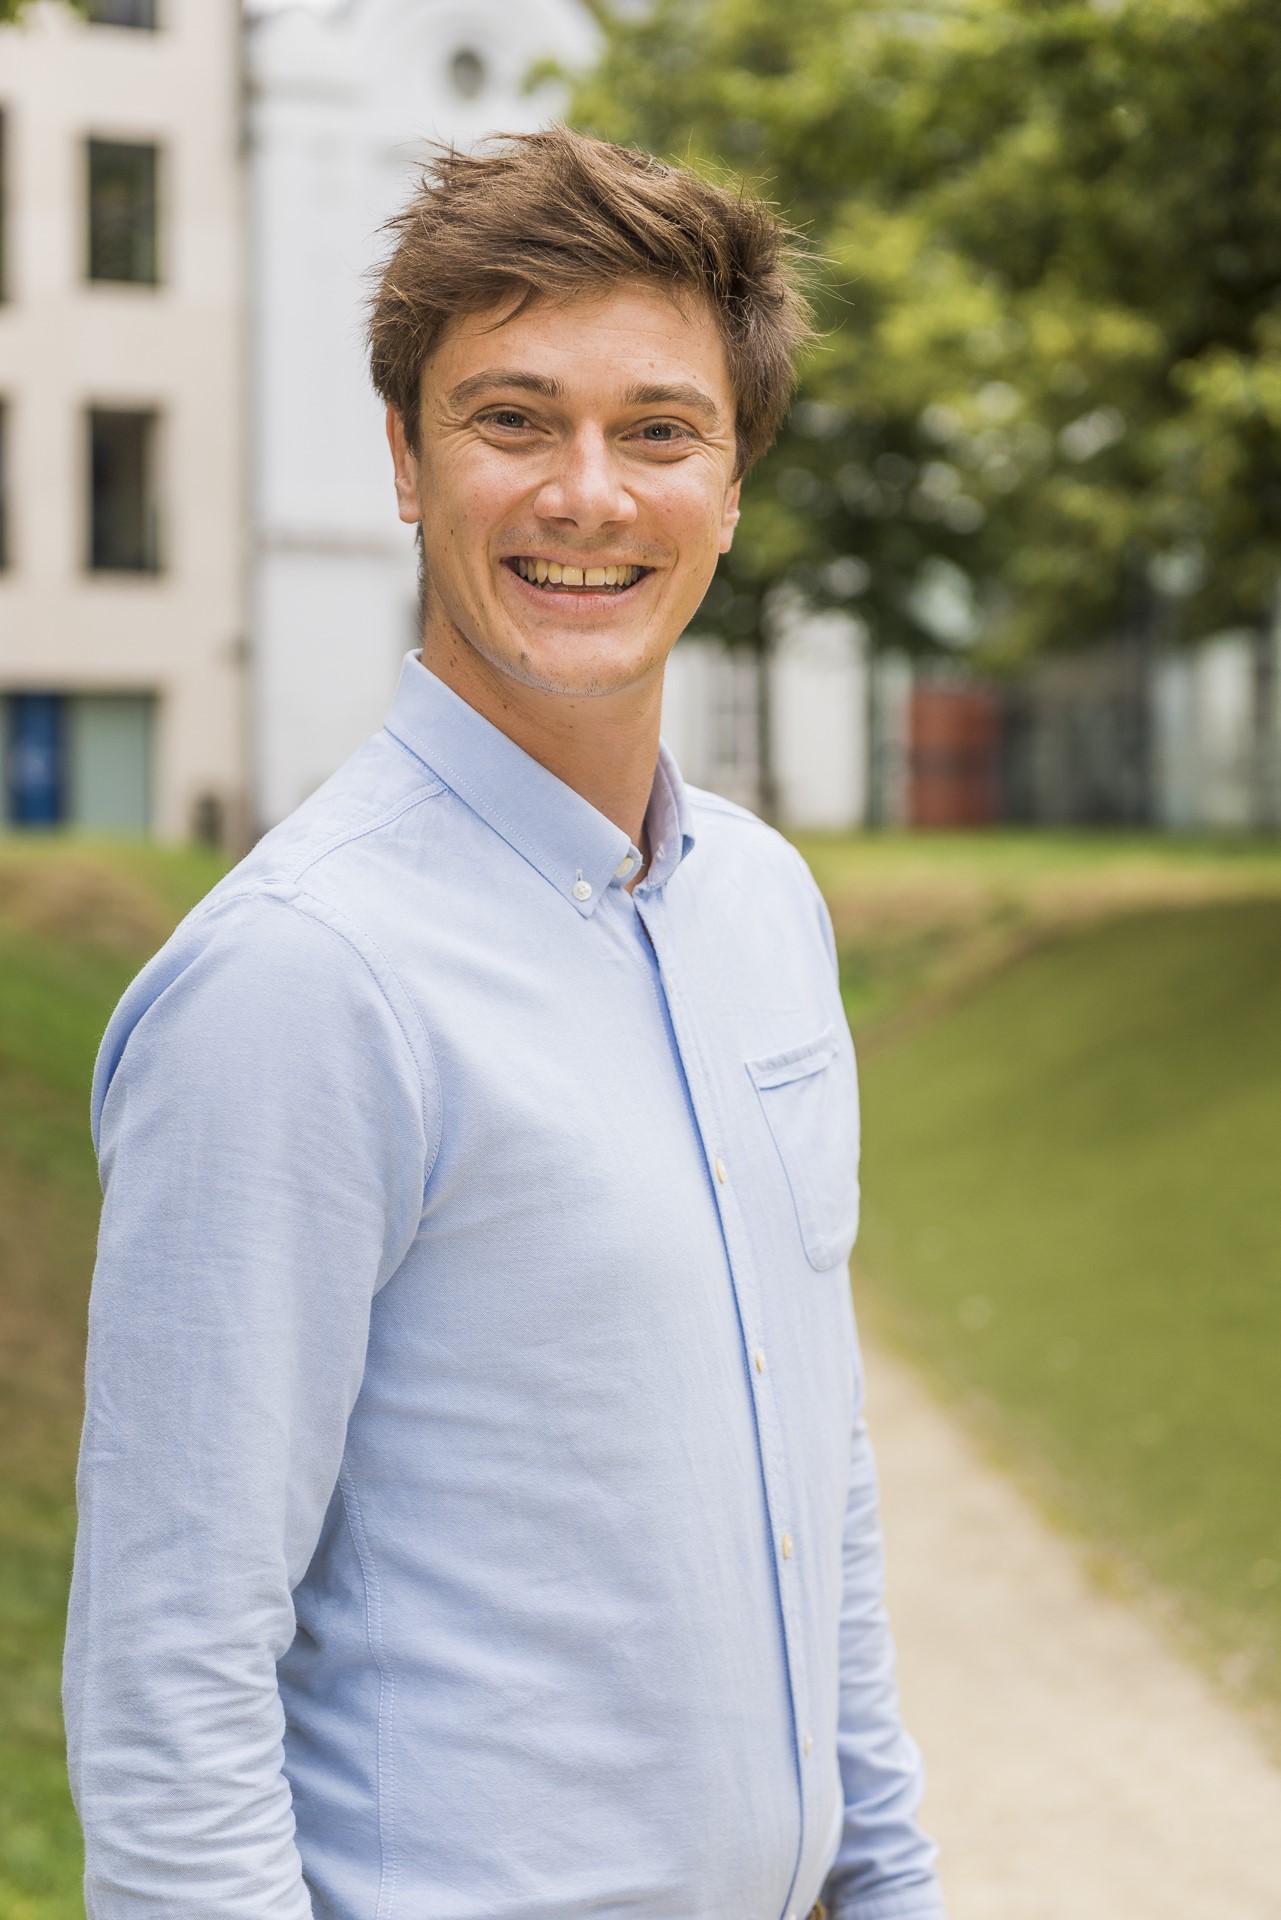 gemeenteraadslid Mats Walschaers